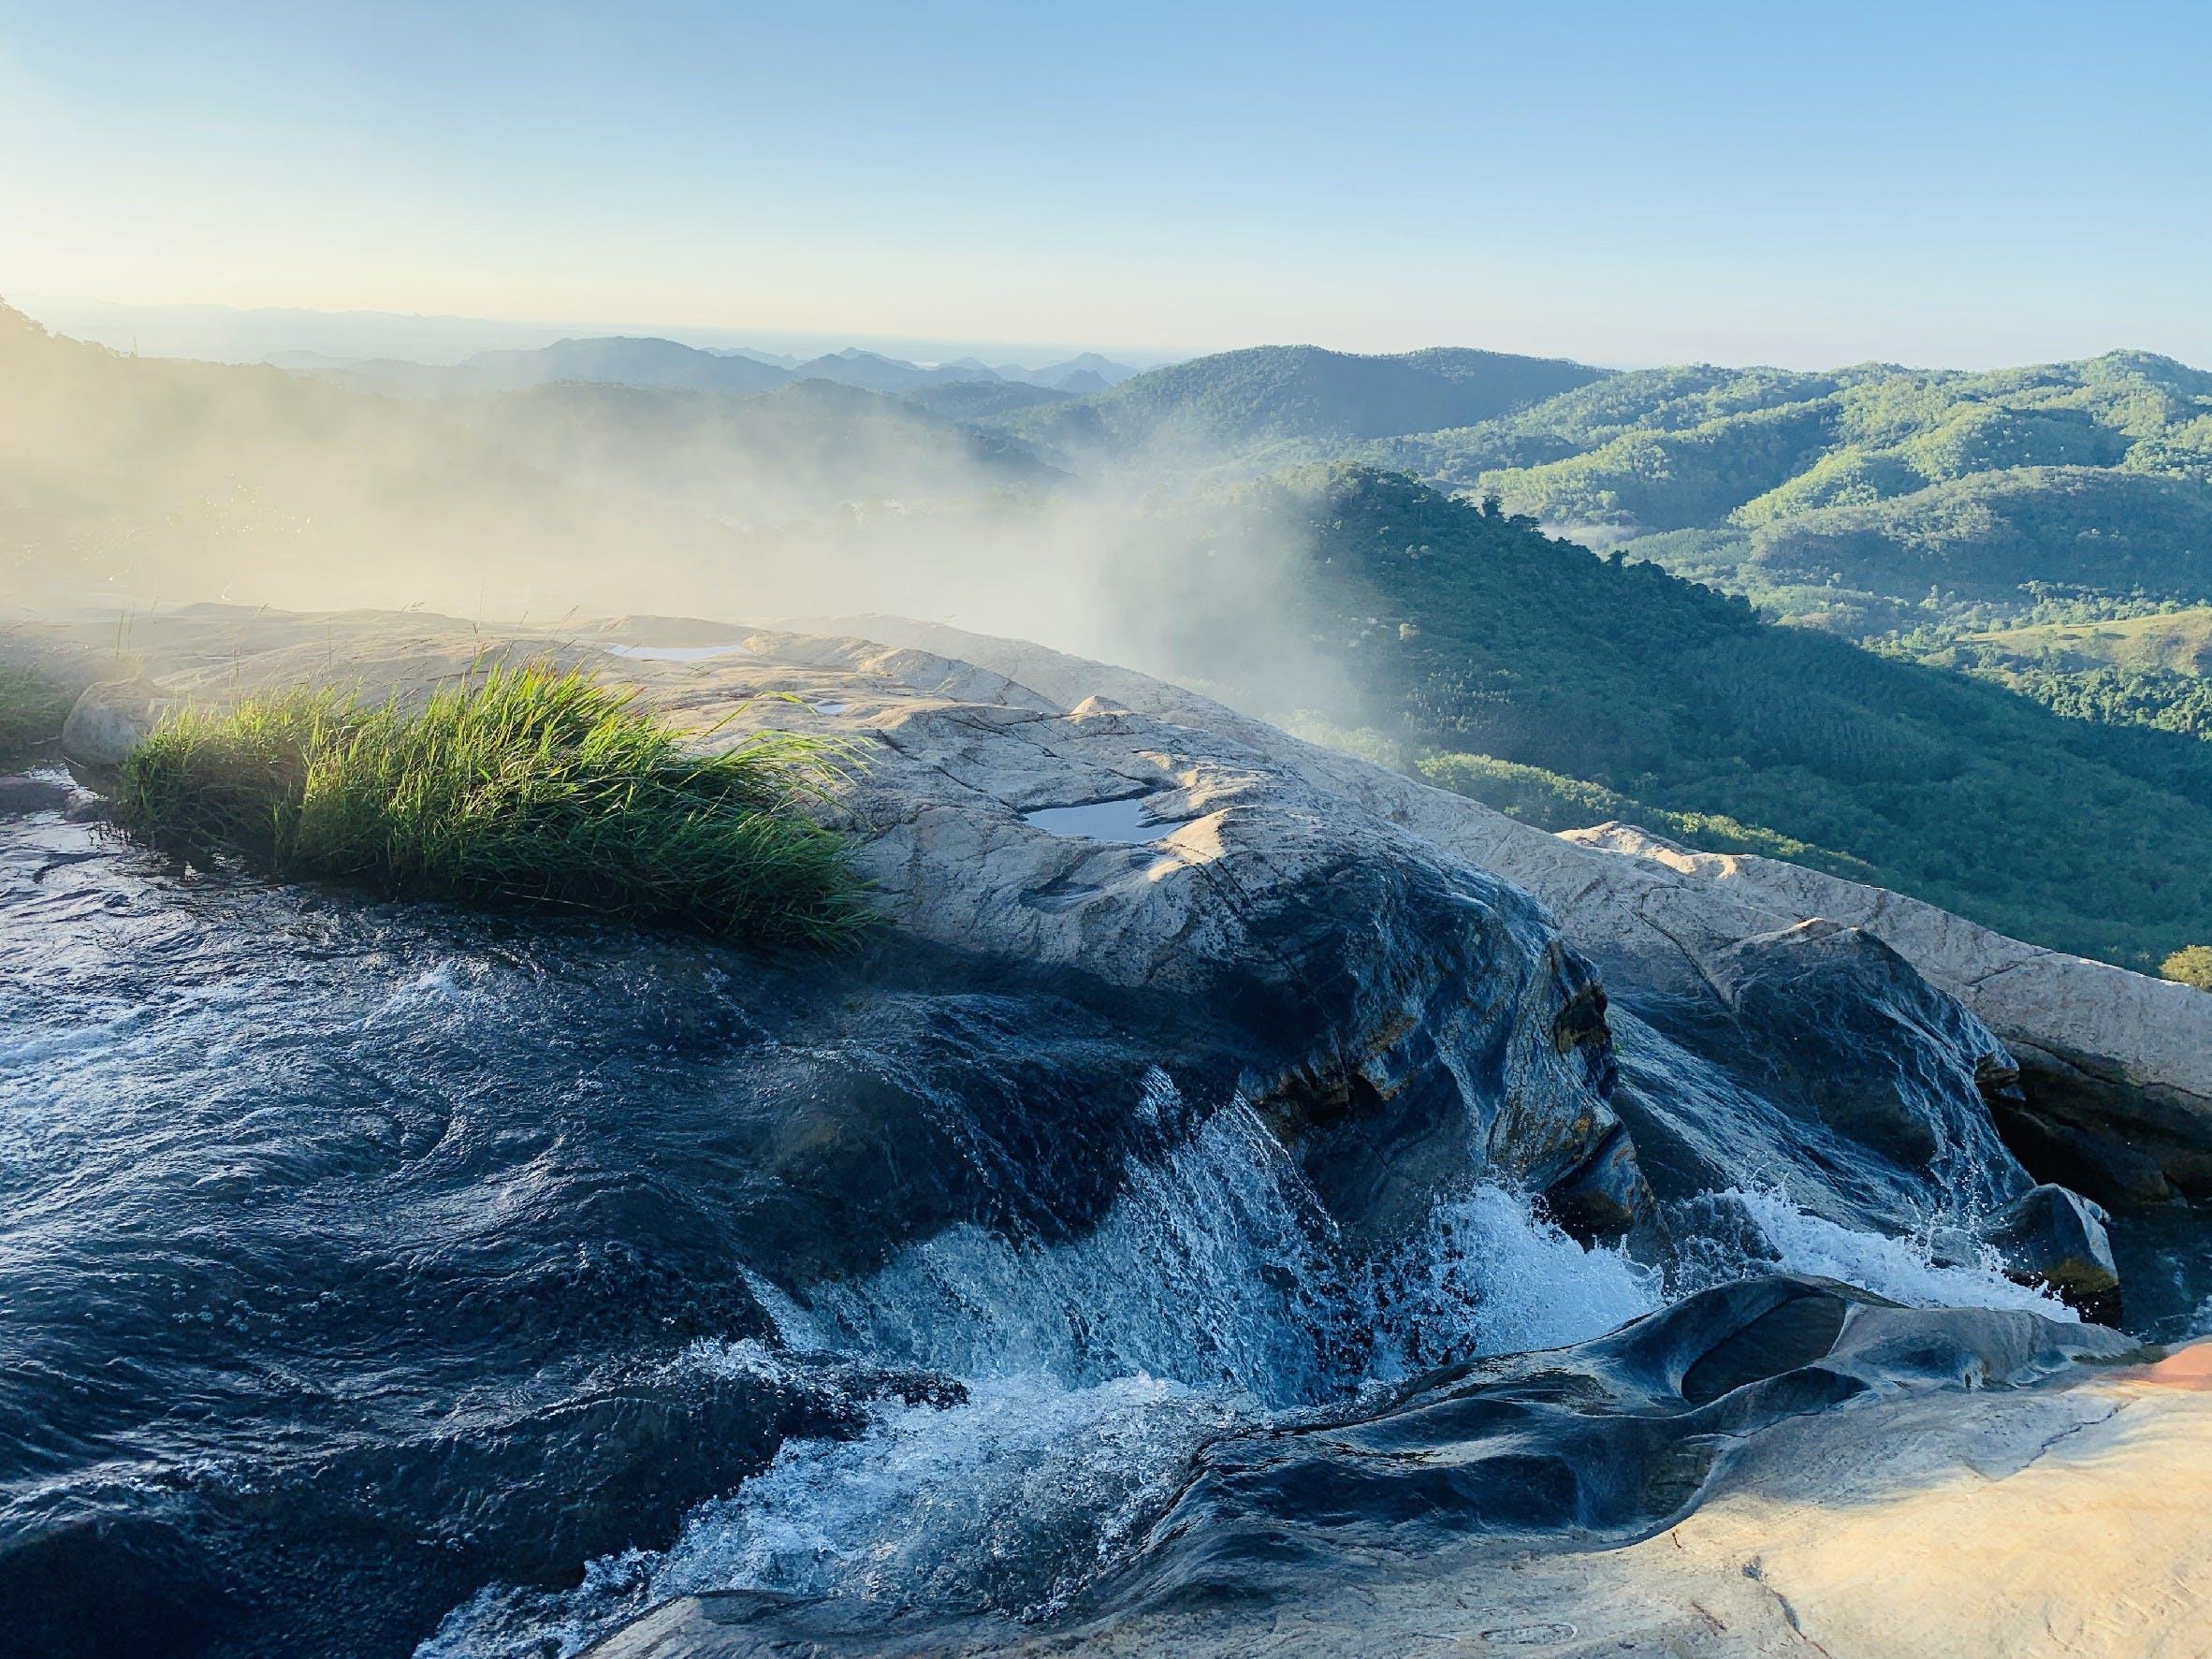 Free stock photo of #falls #water #mountains #morning